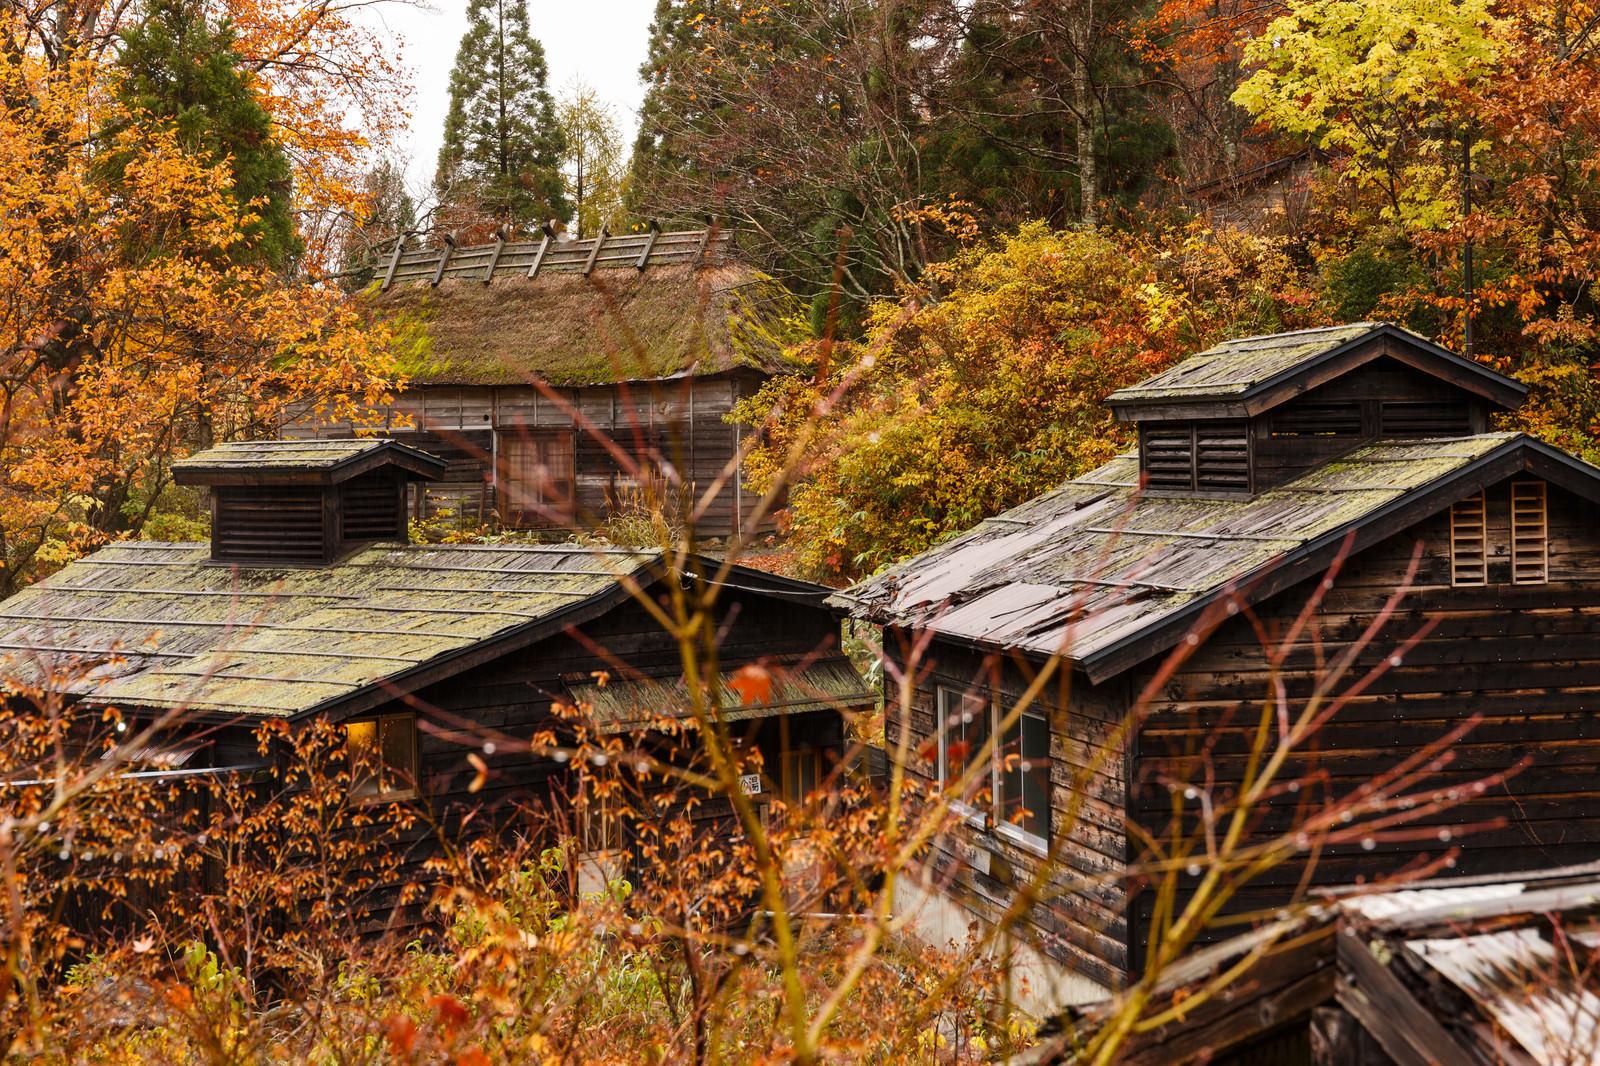 「山間の温泉宿(紅葉時期)」の写真